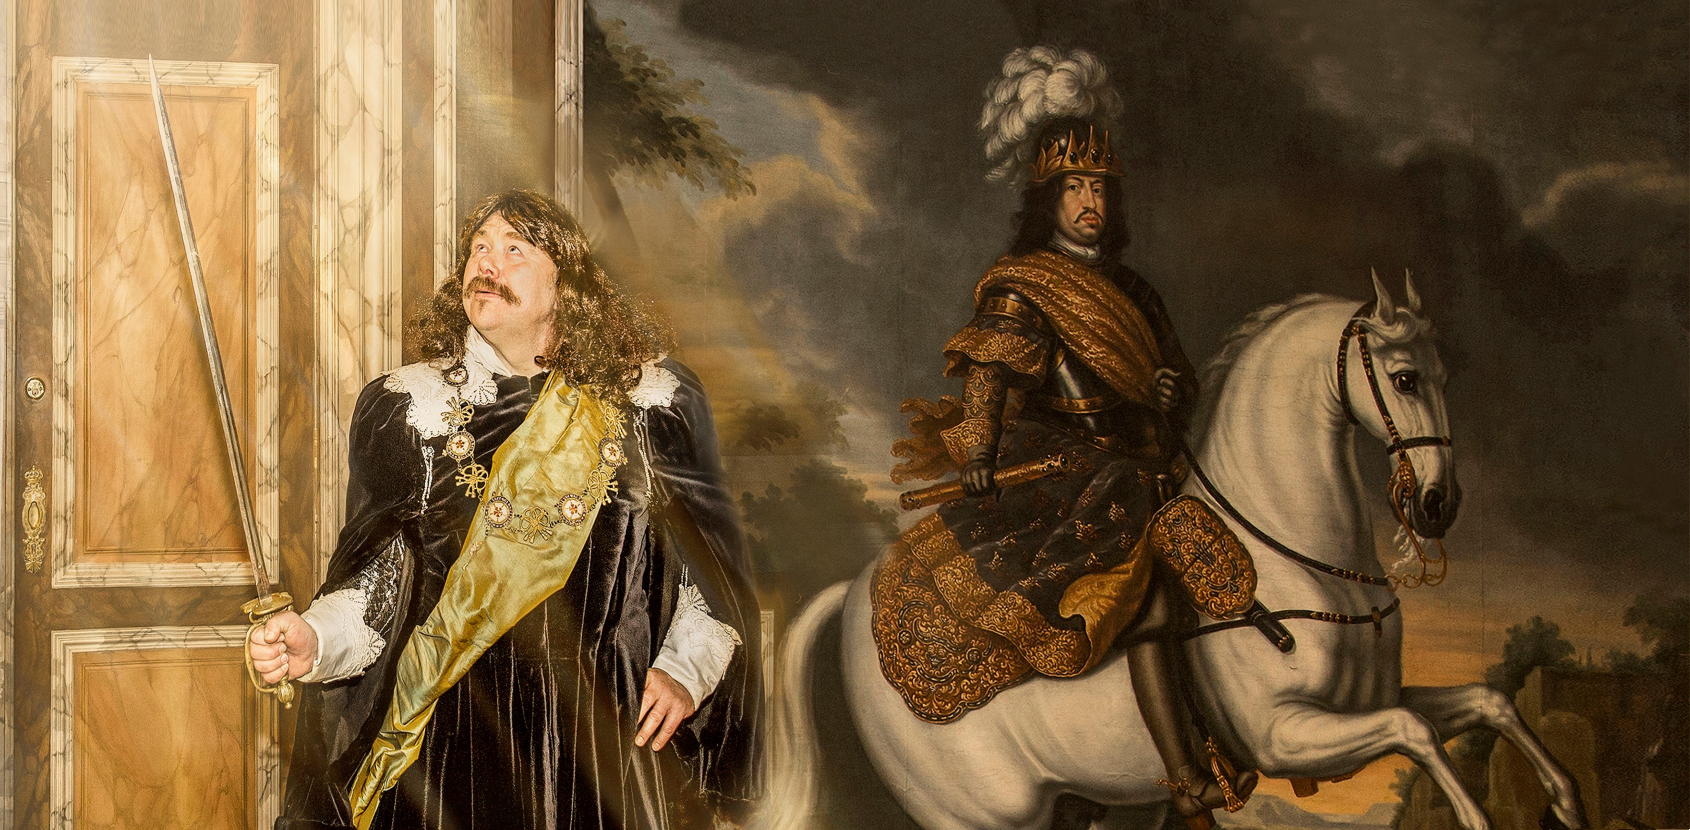 Mød Frederik 3. på Christianborg Slot i vinterferien